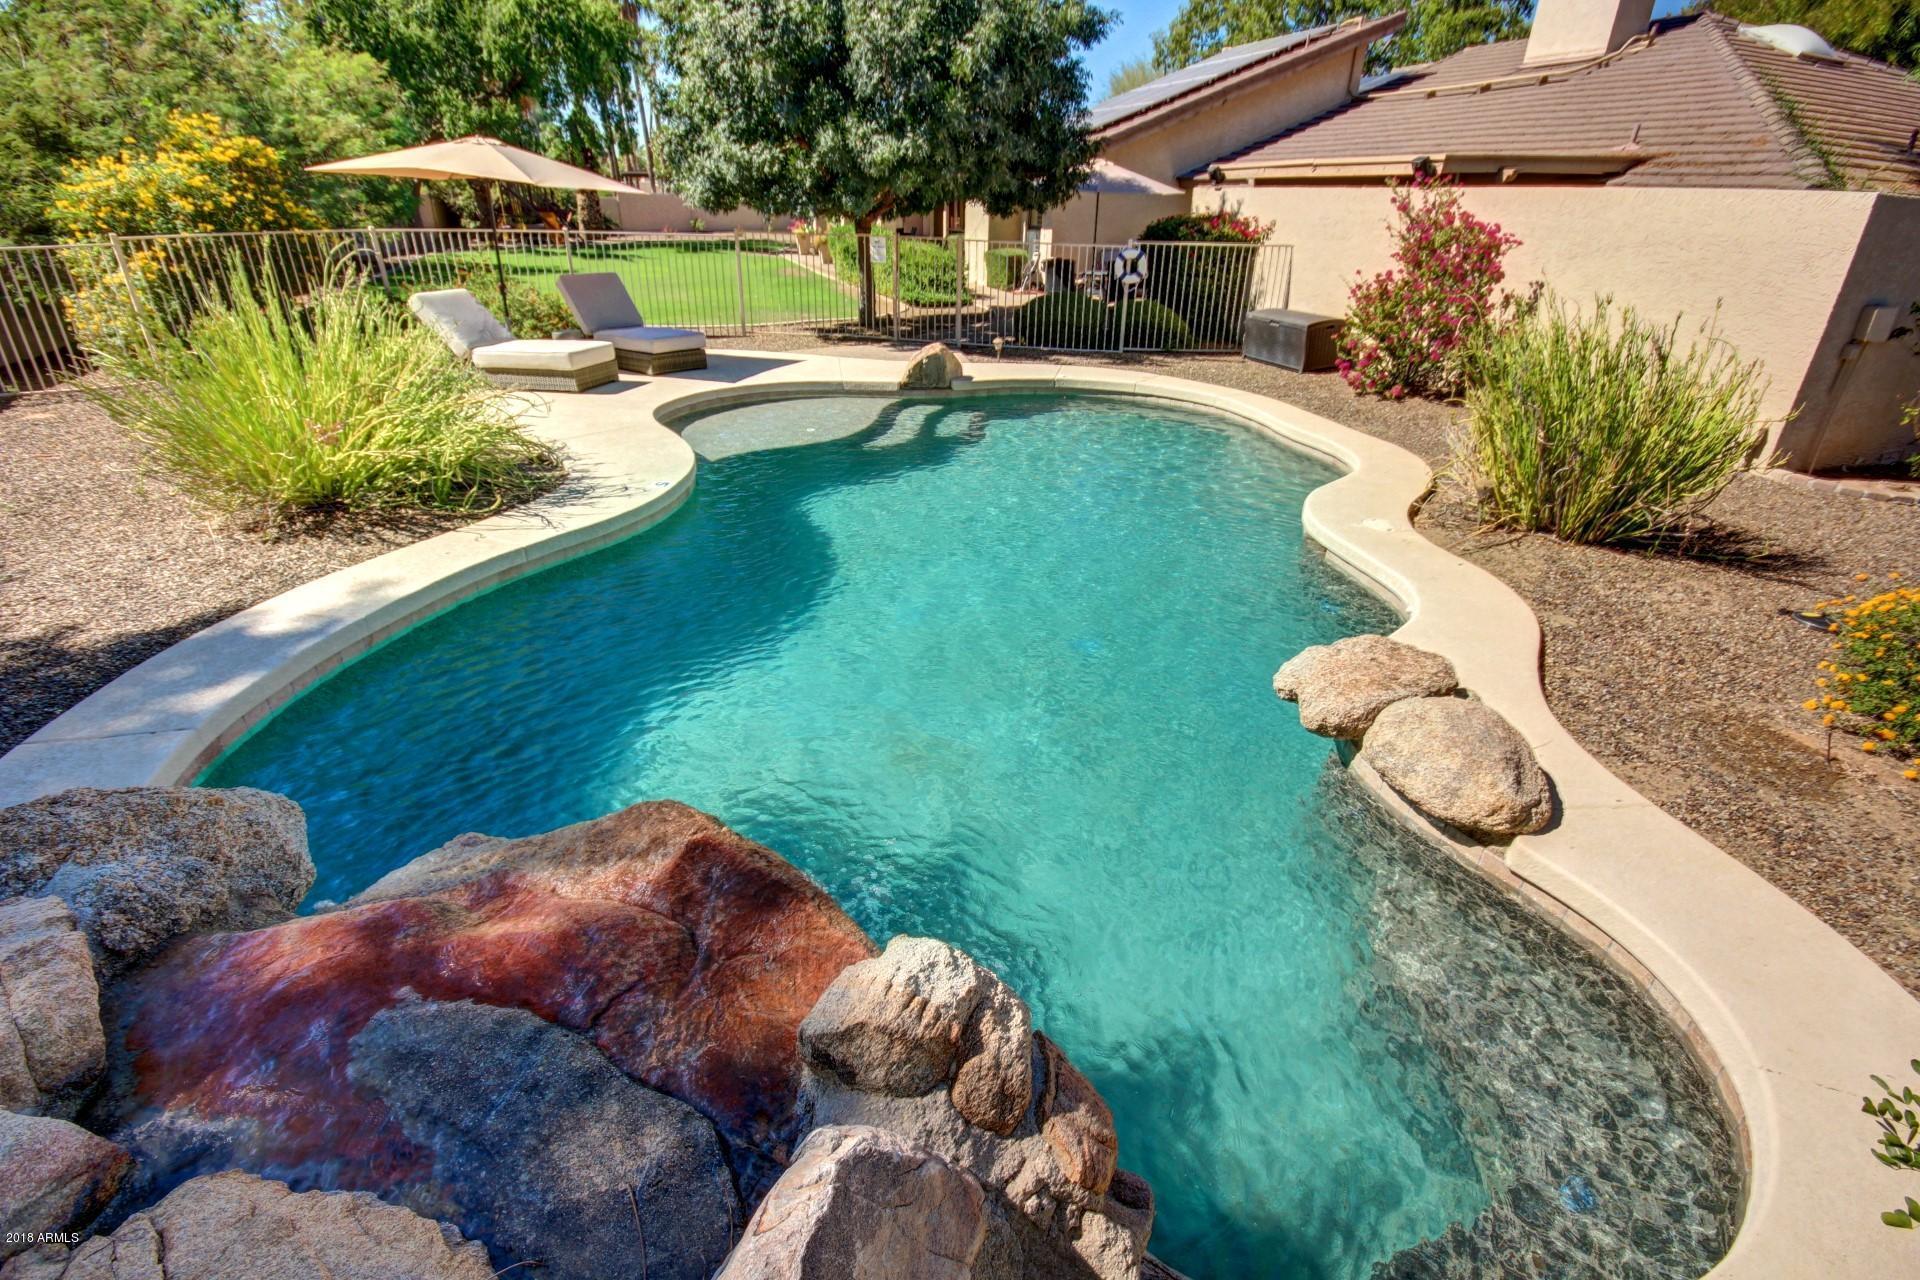 MLS 5813694 8365 E SUTTON Drive, Scottsdale, AZ 85260 Scottsdale AZ Private Pool